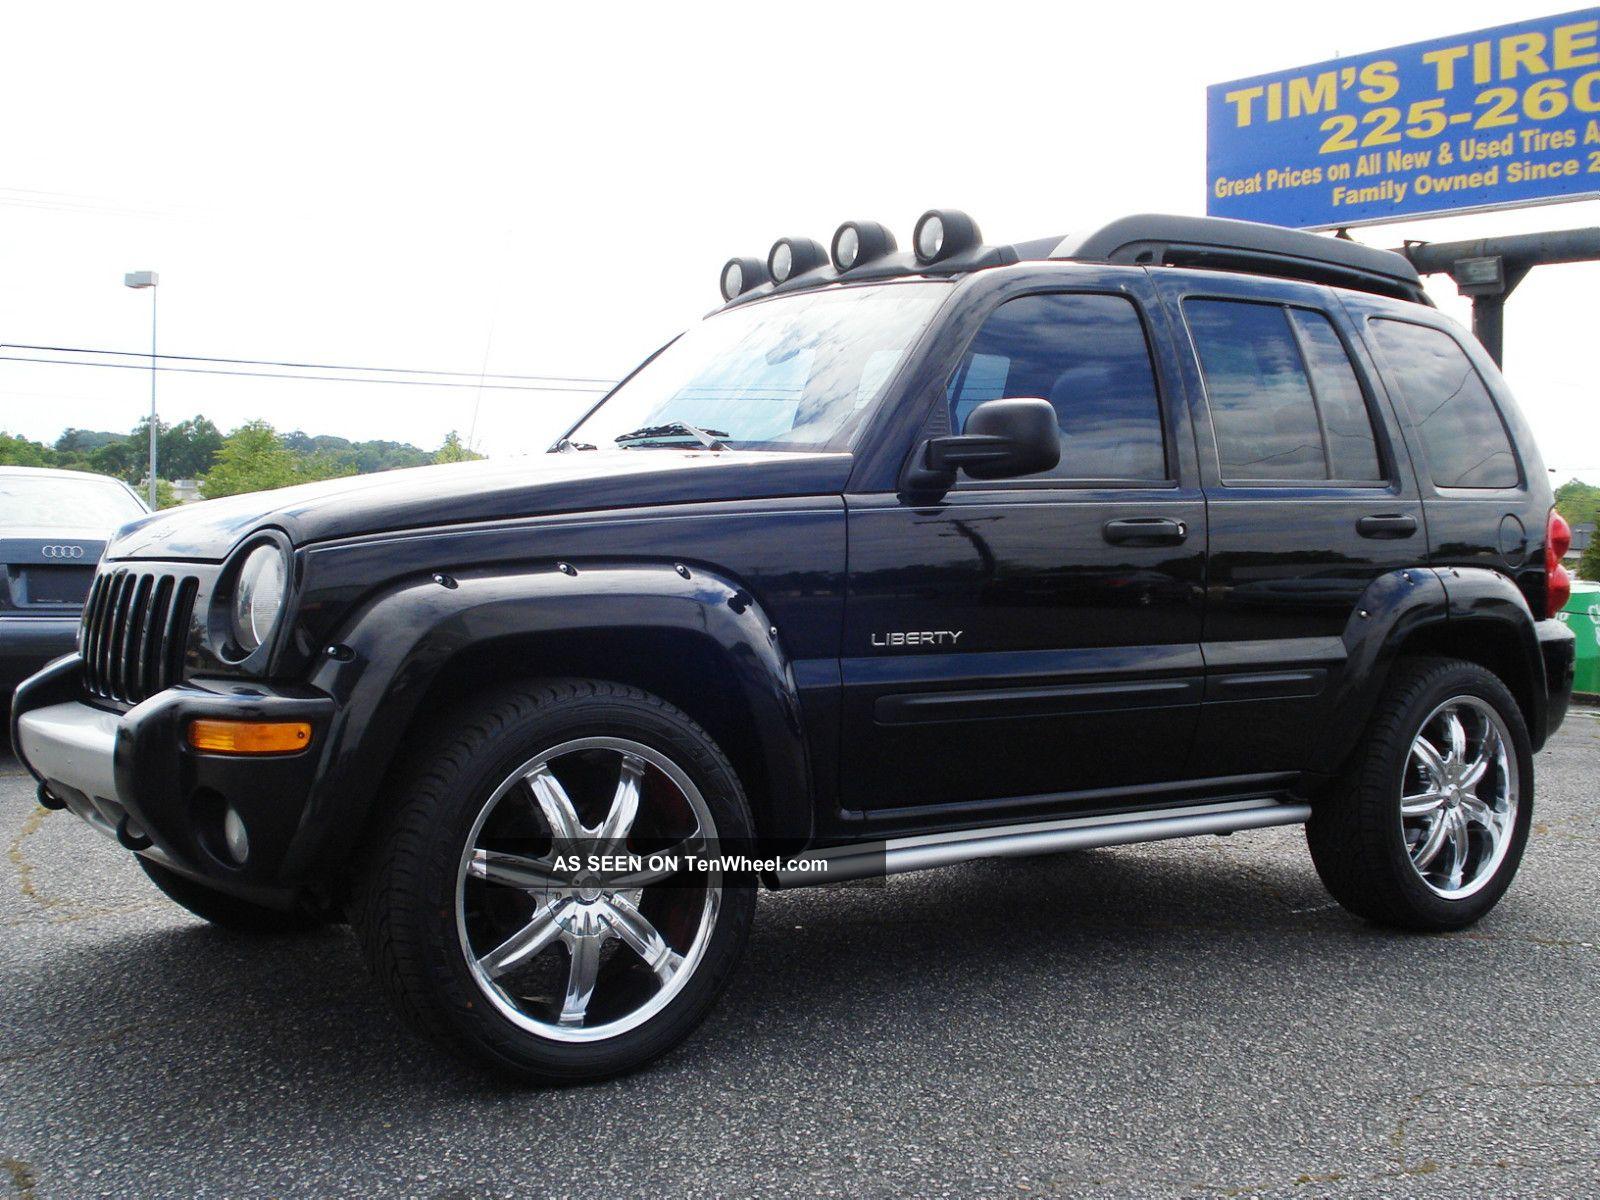 2004 jeep liberty - image #29